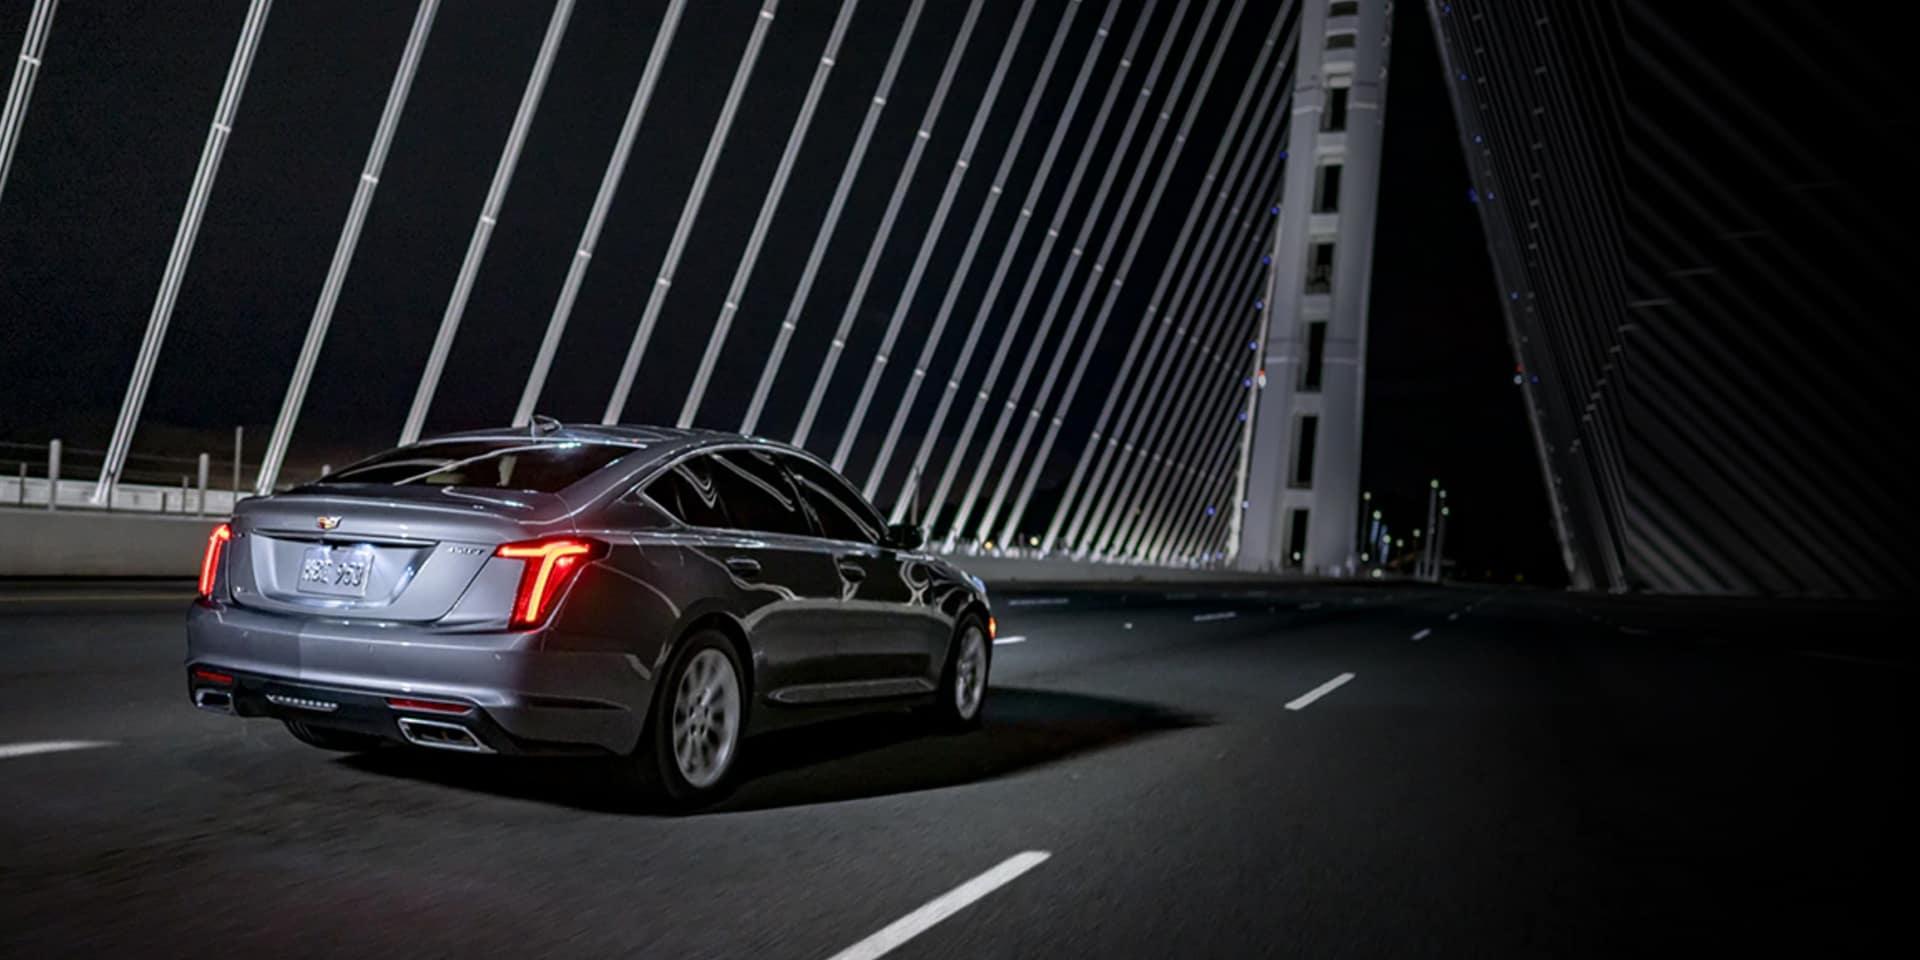 Cadillac vehicle on bridge